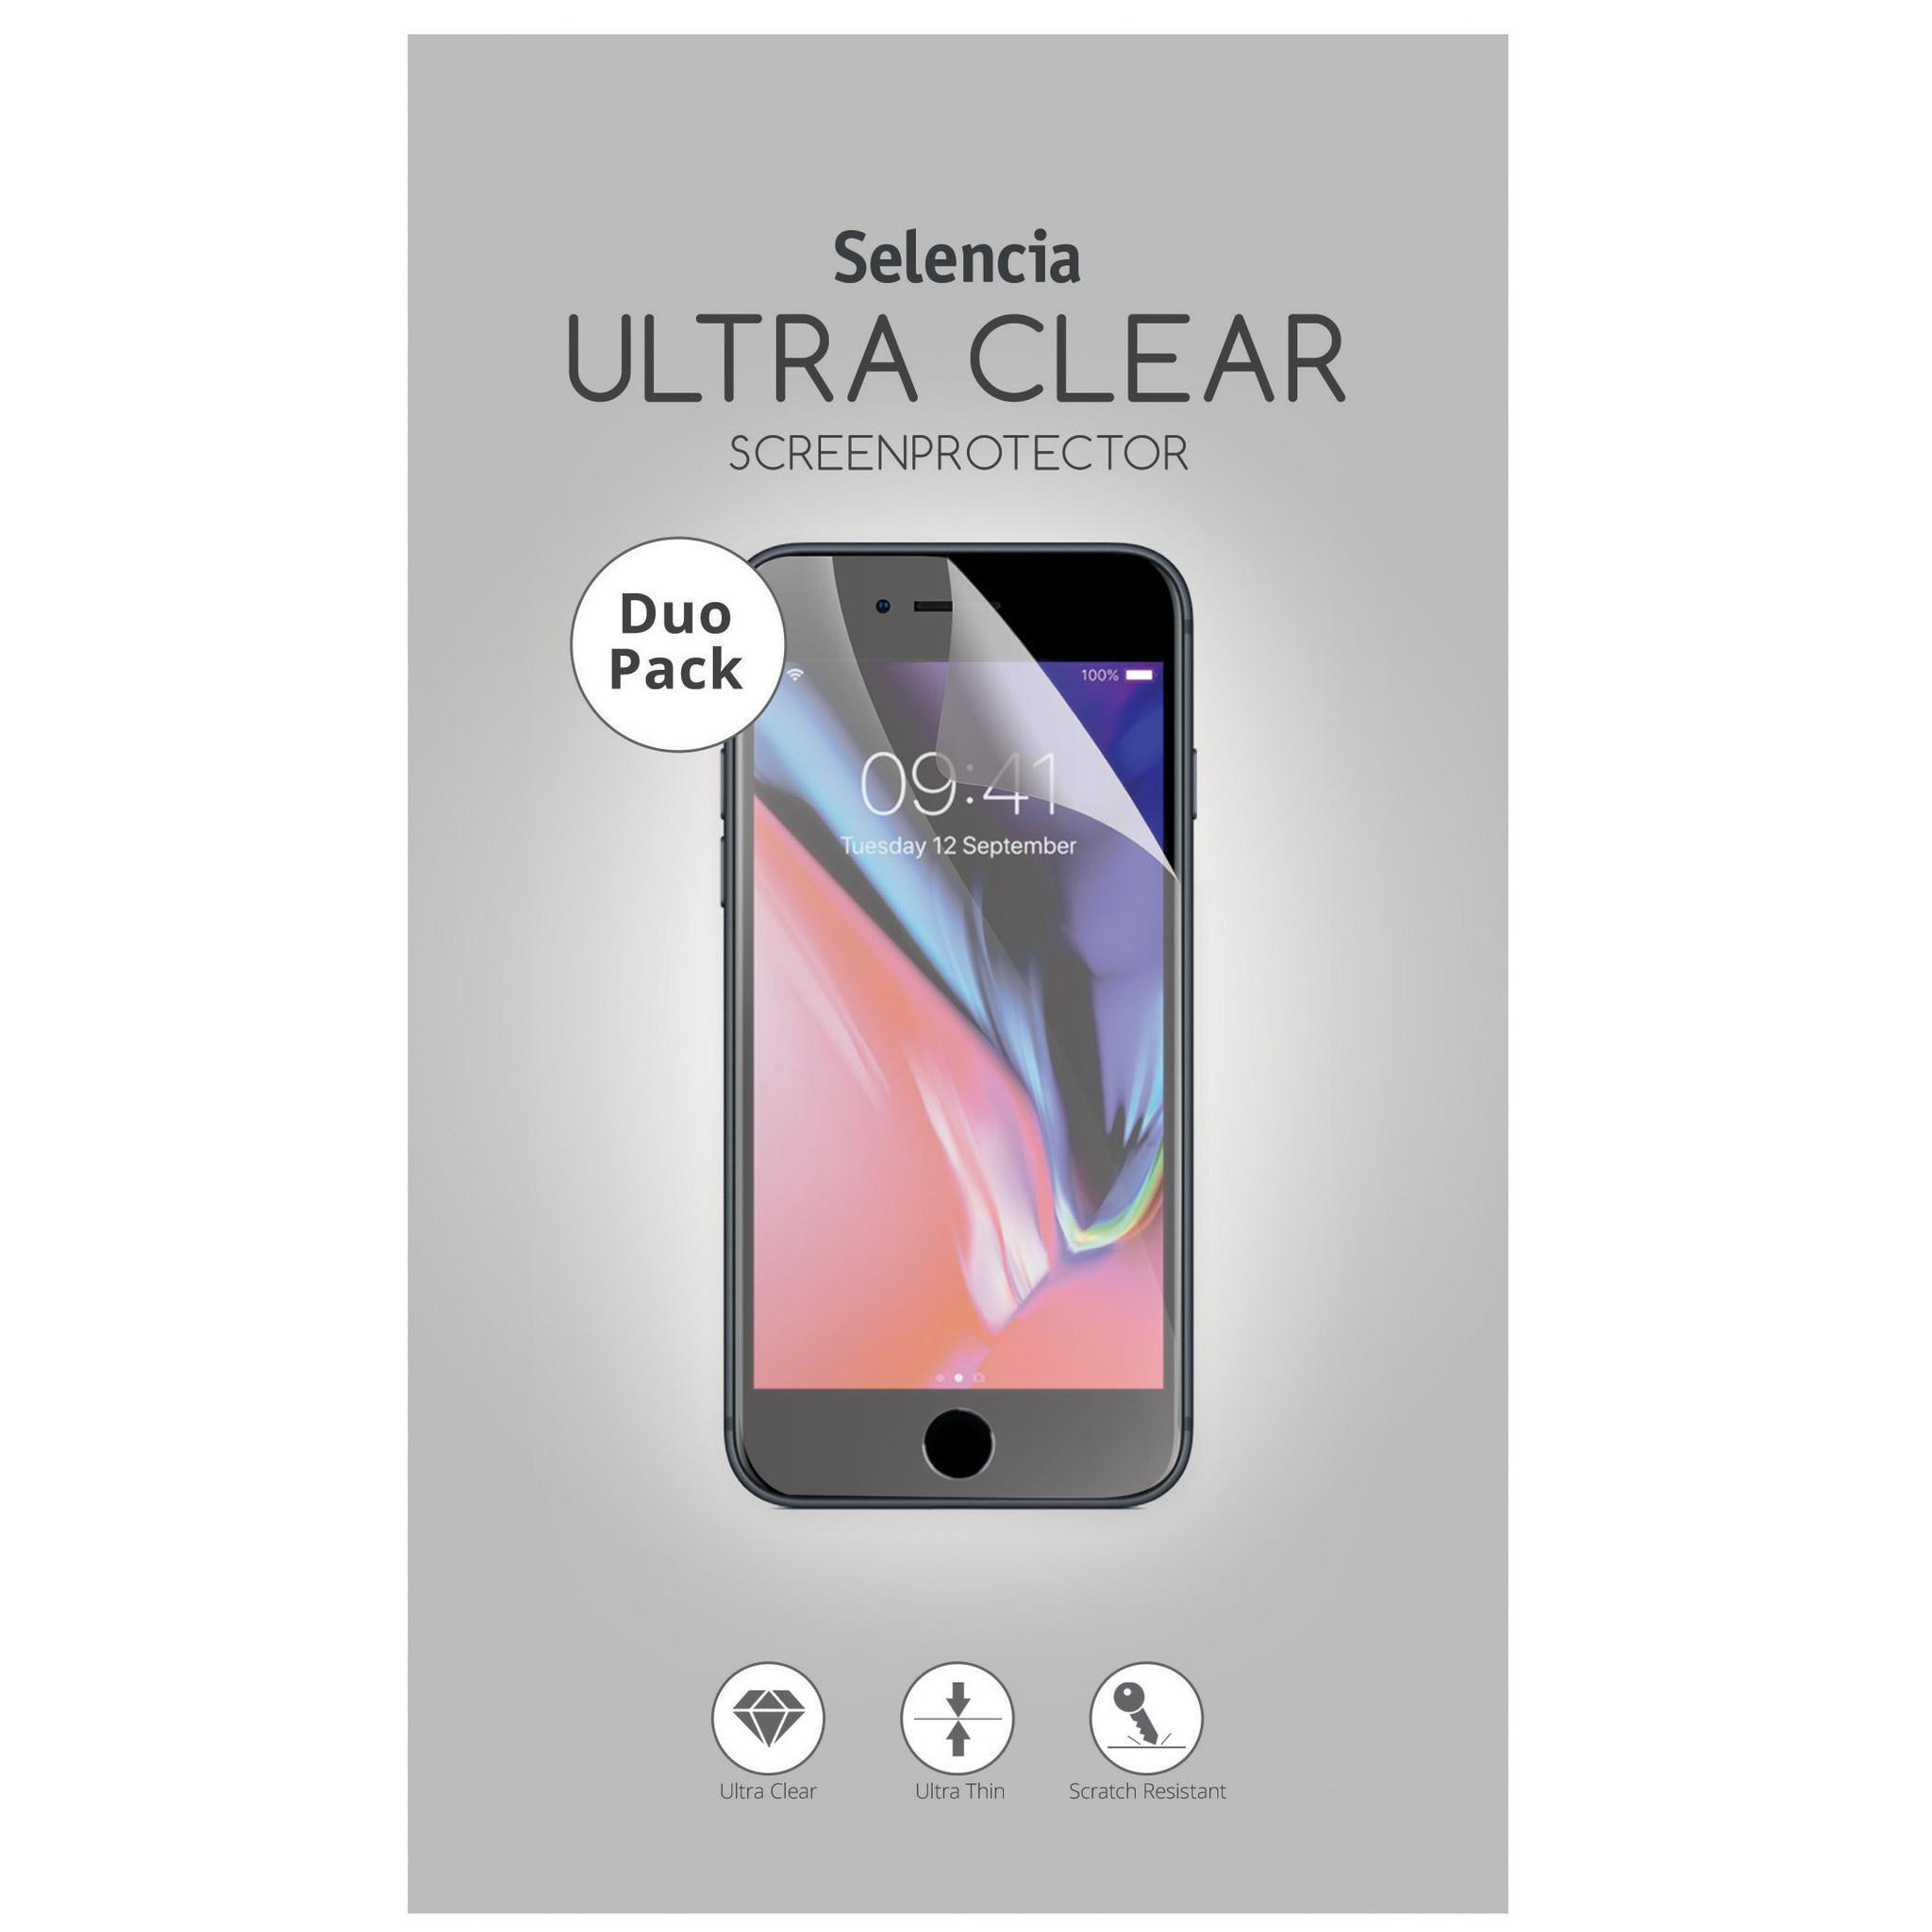 Selencia Duo Pack Screenprotector für das Samsung Galaxy A8 (2018)